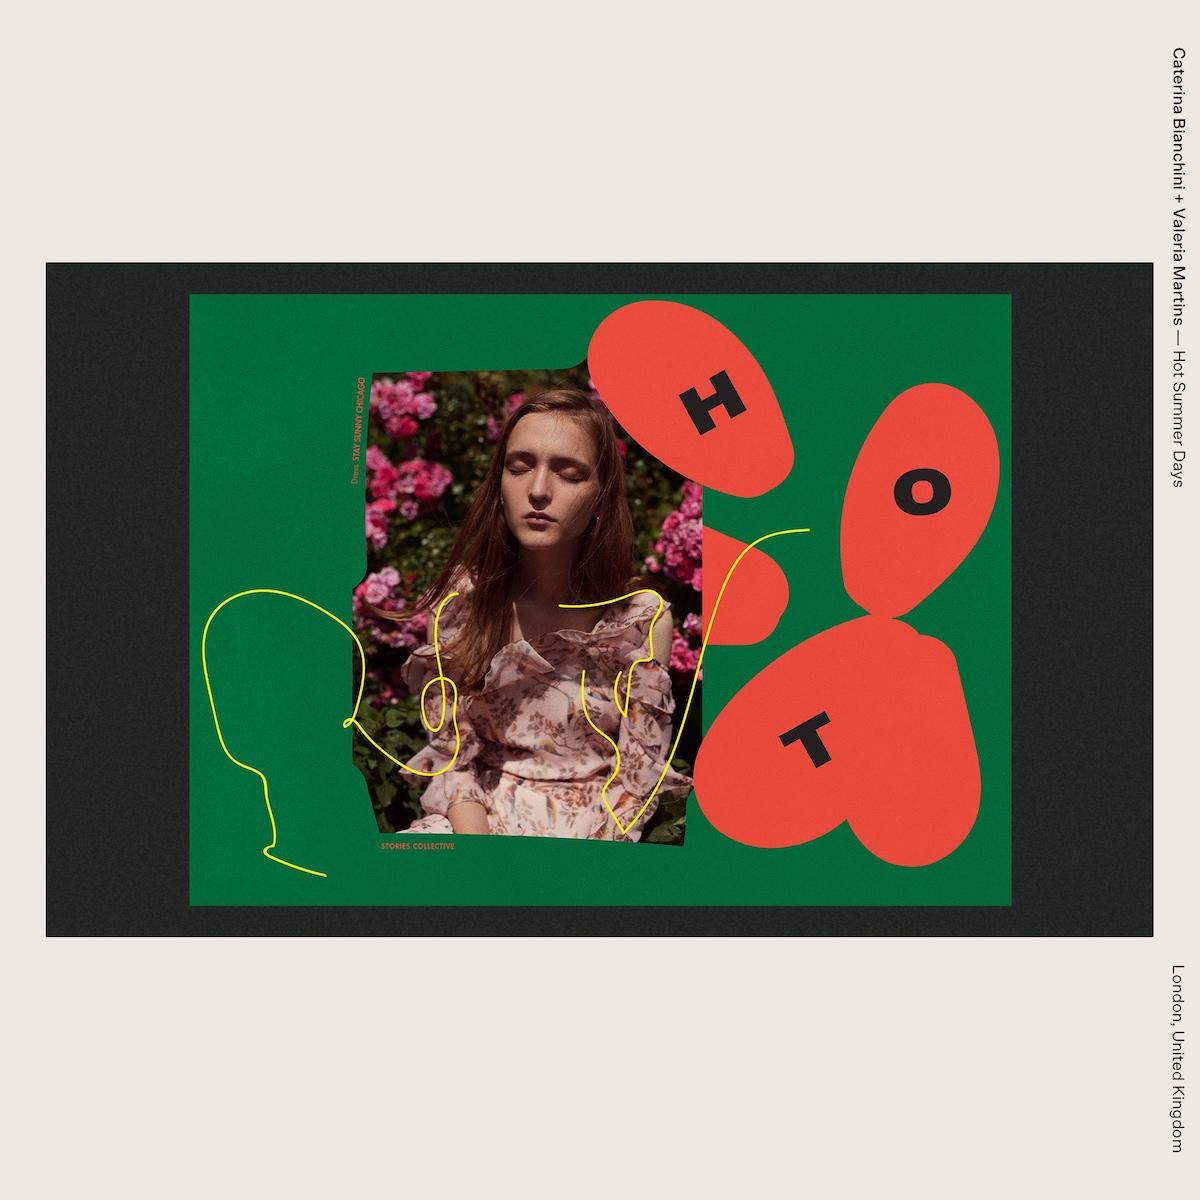 Caterina Bianchini + Valeria Martins — Hot Summer Days